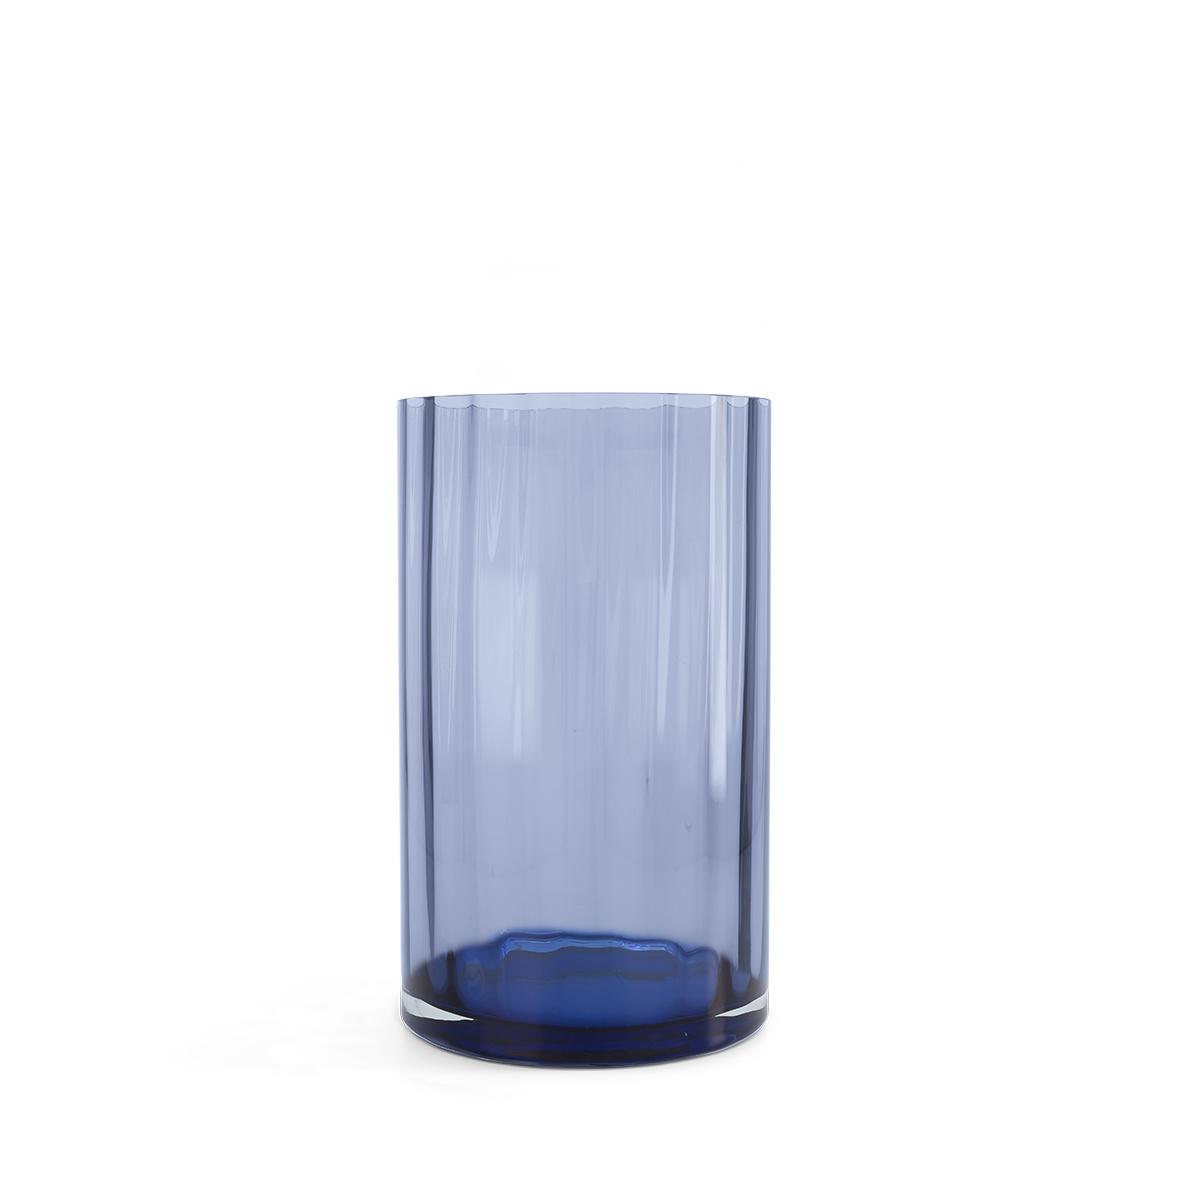 Chiara blue vase